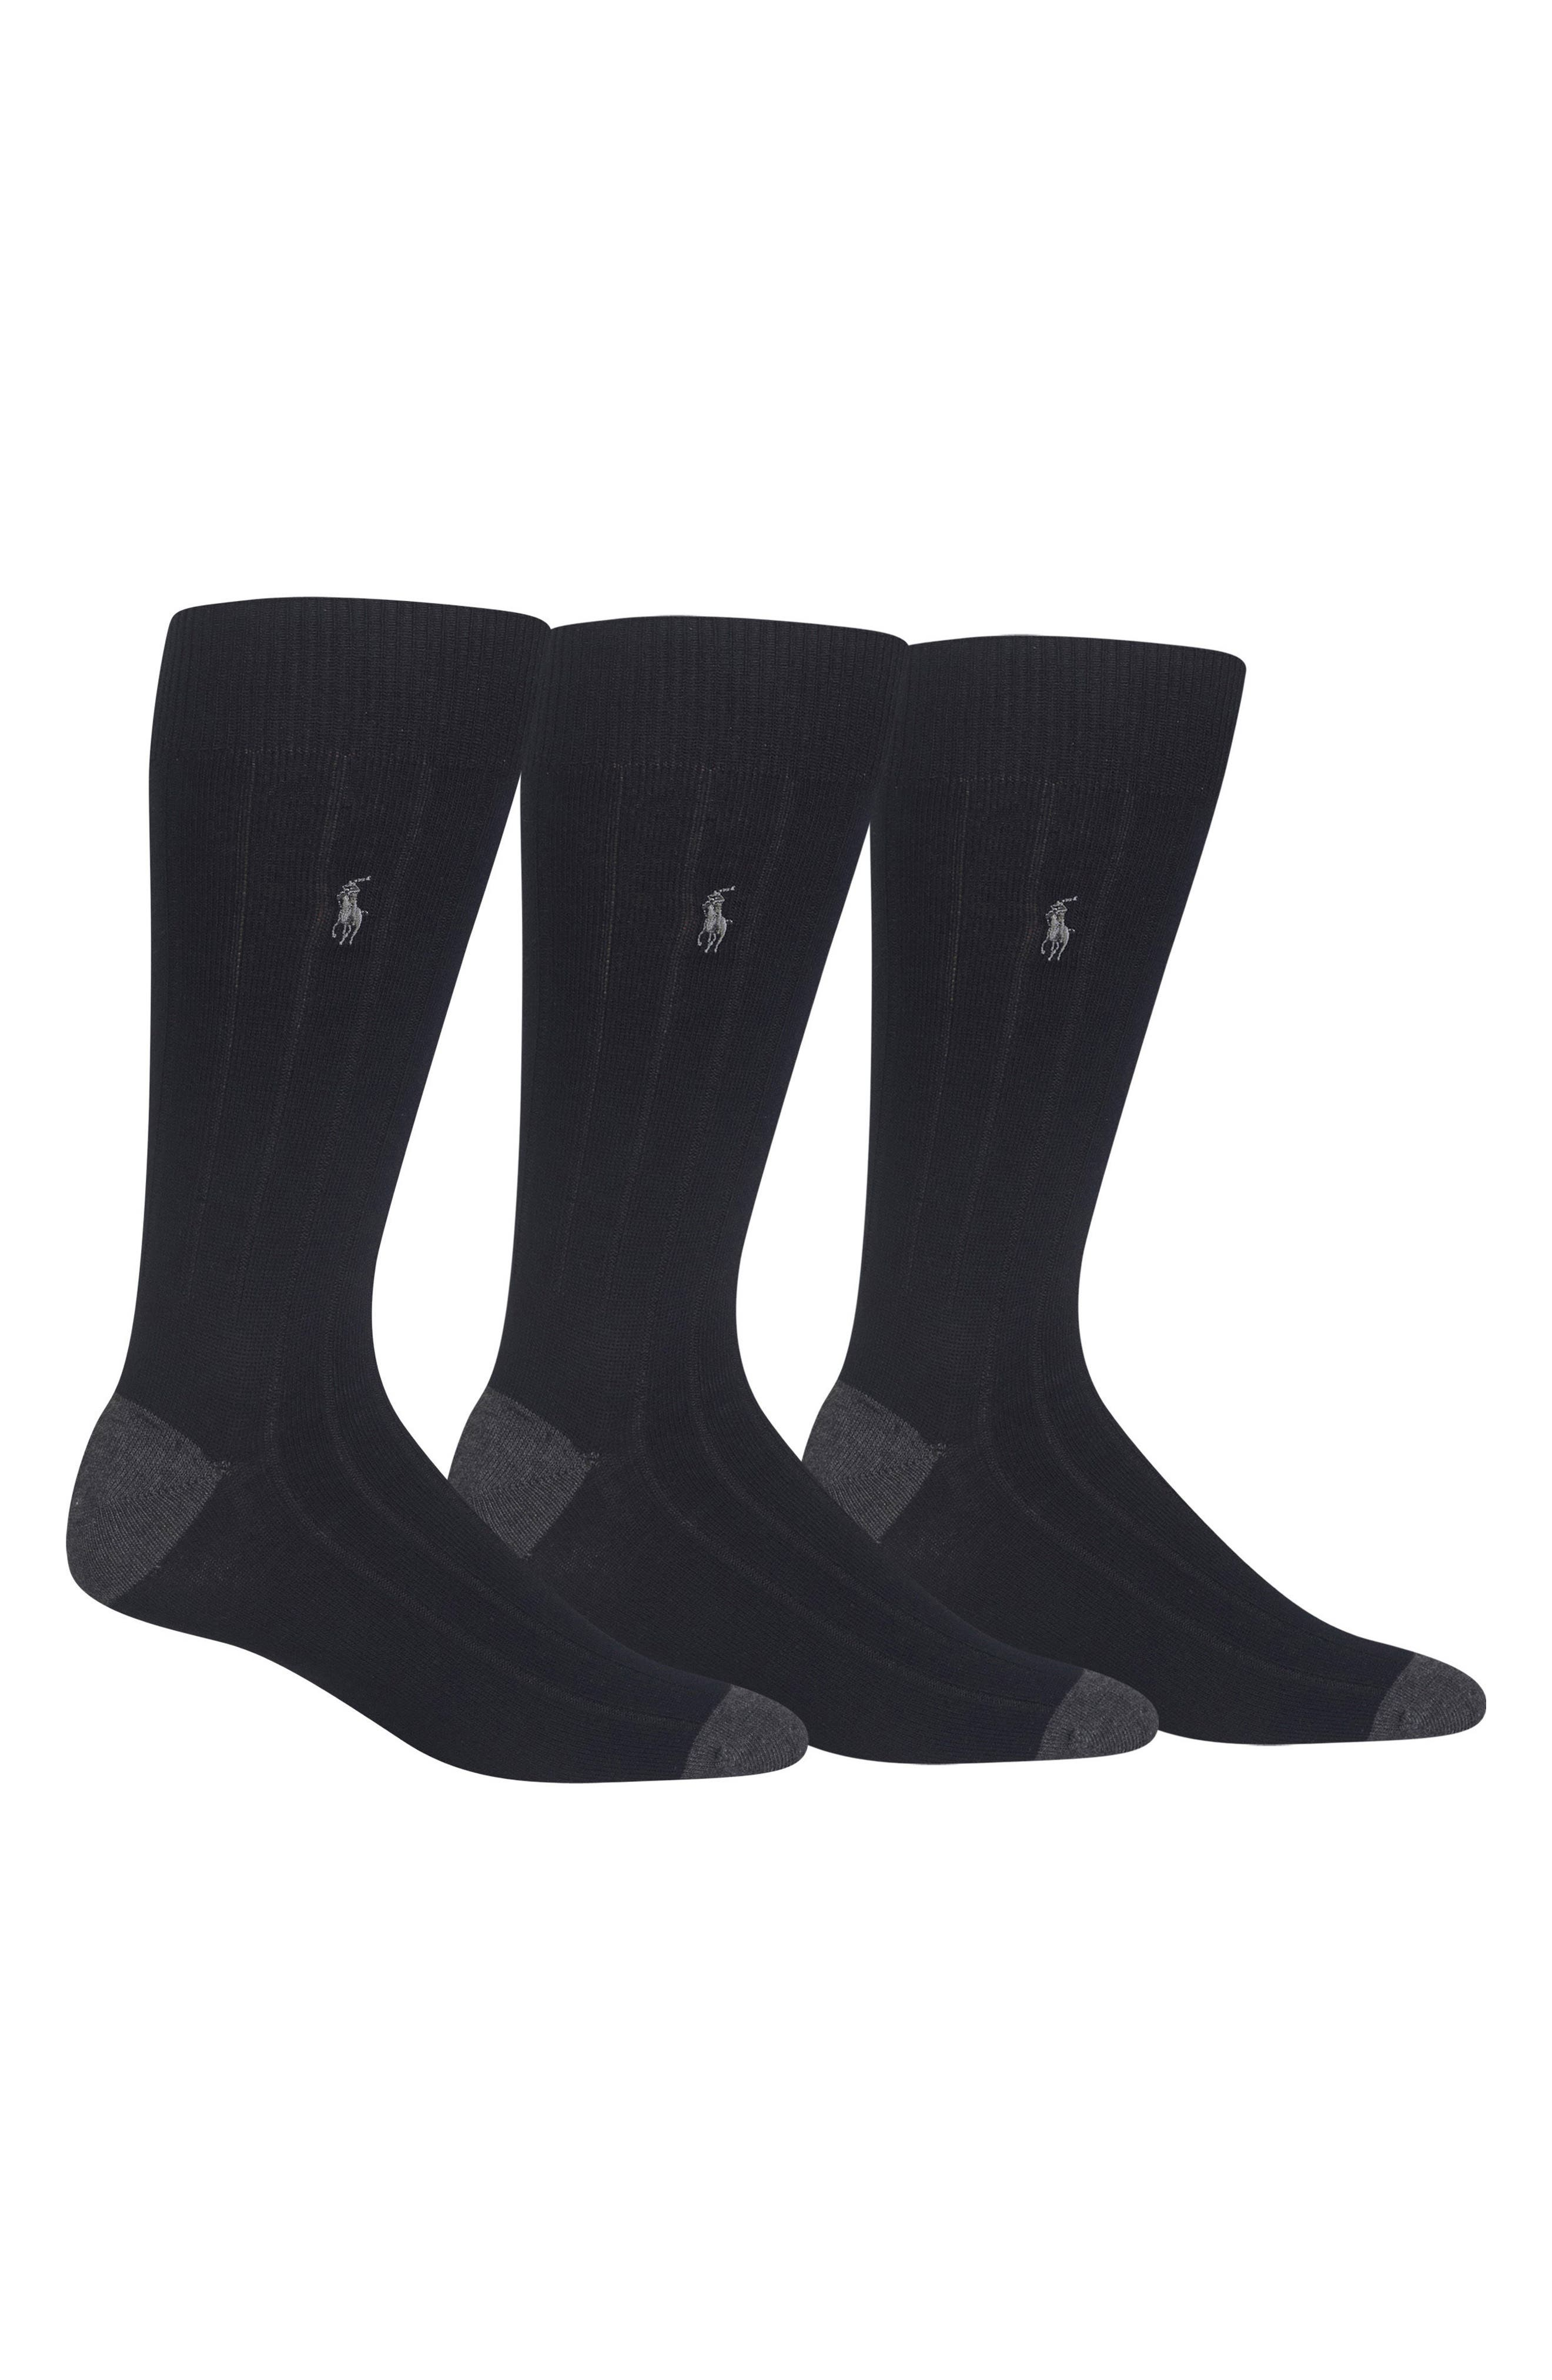 POLO RALPH LAUREN 3-Pack Ribbed Socks, Main, color, 001